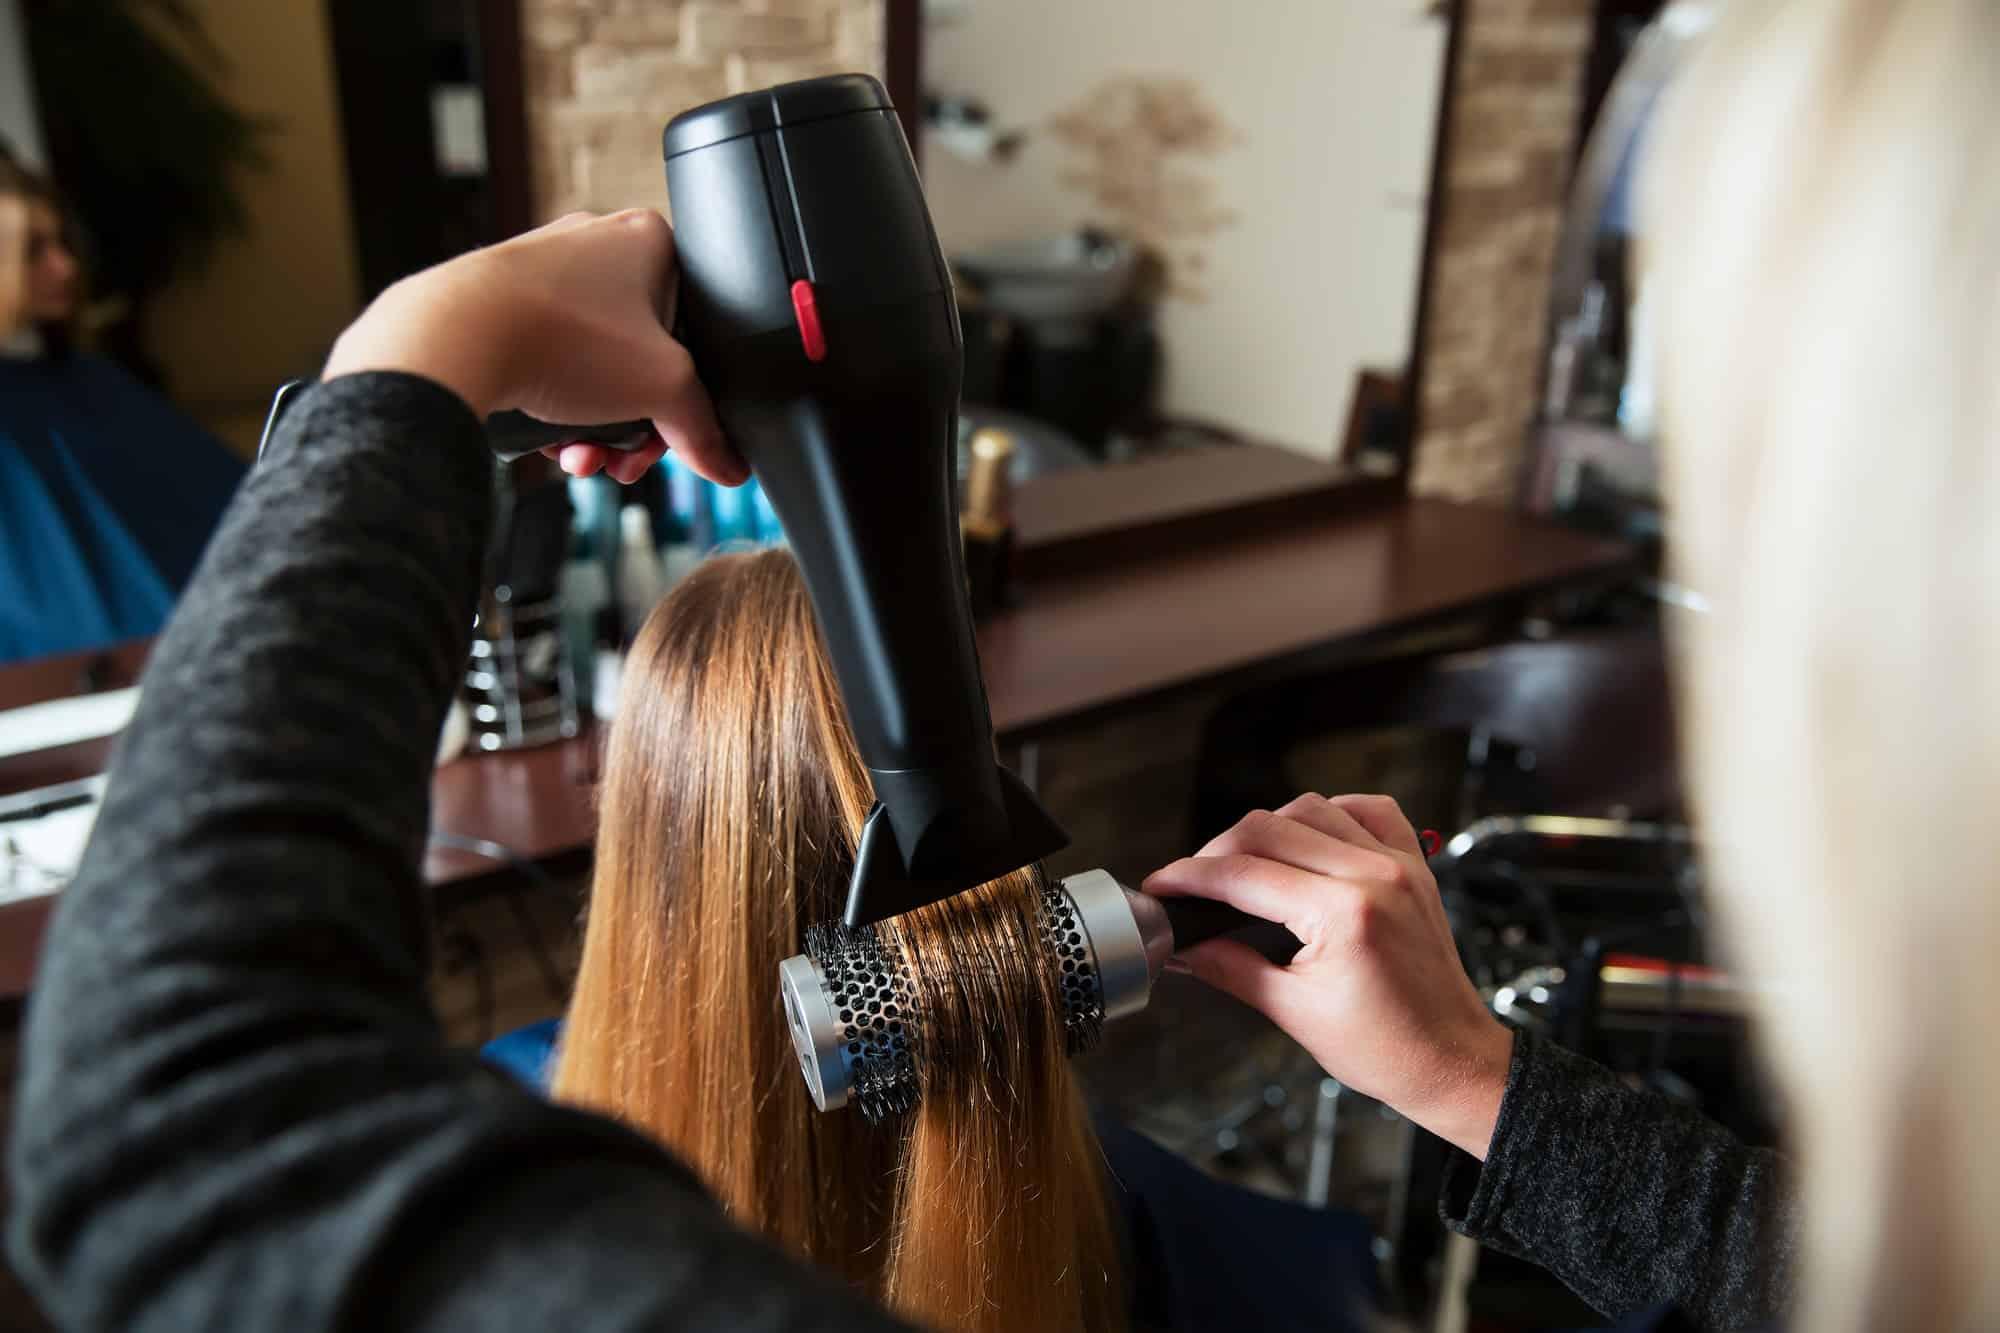 Making hairstyle using hair dryer.